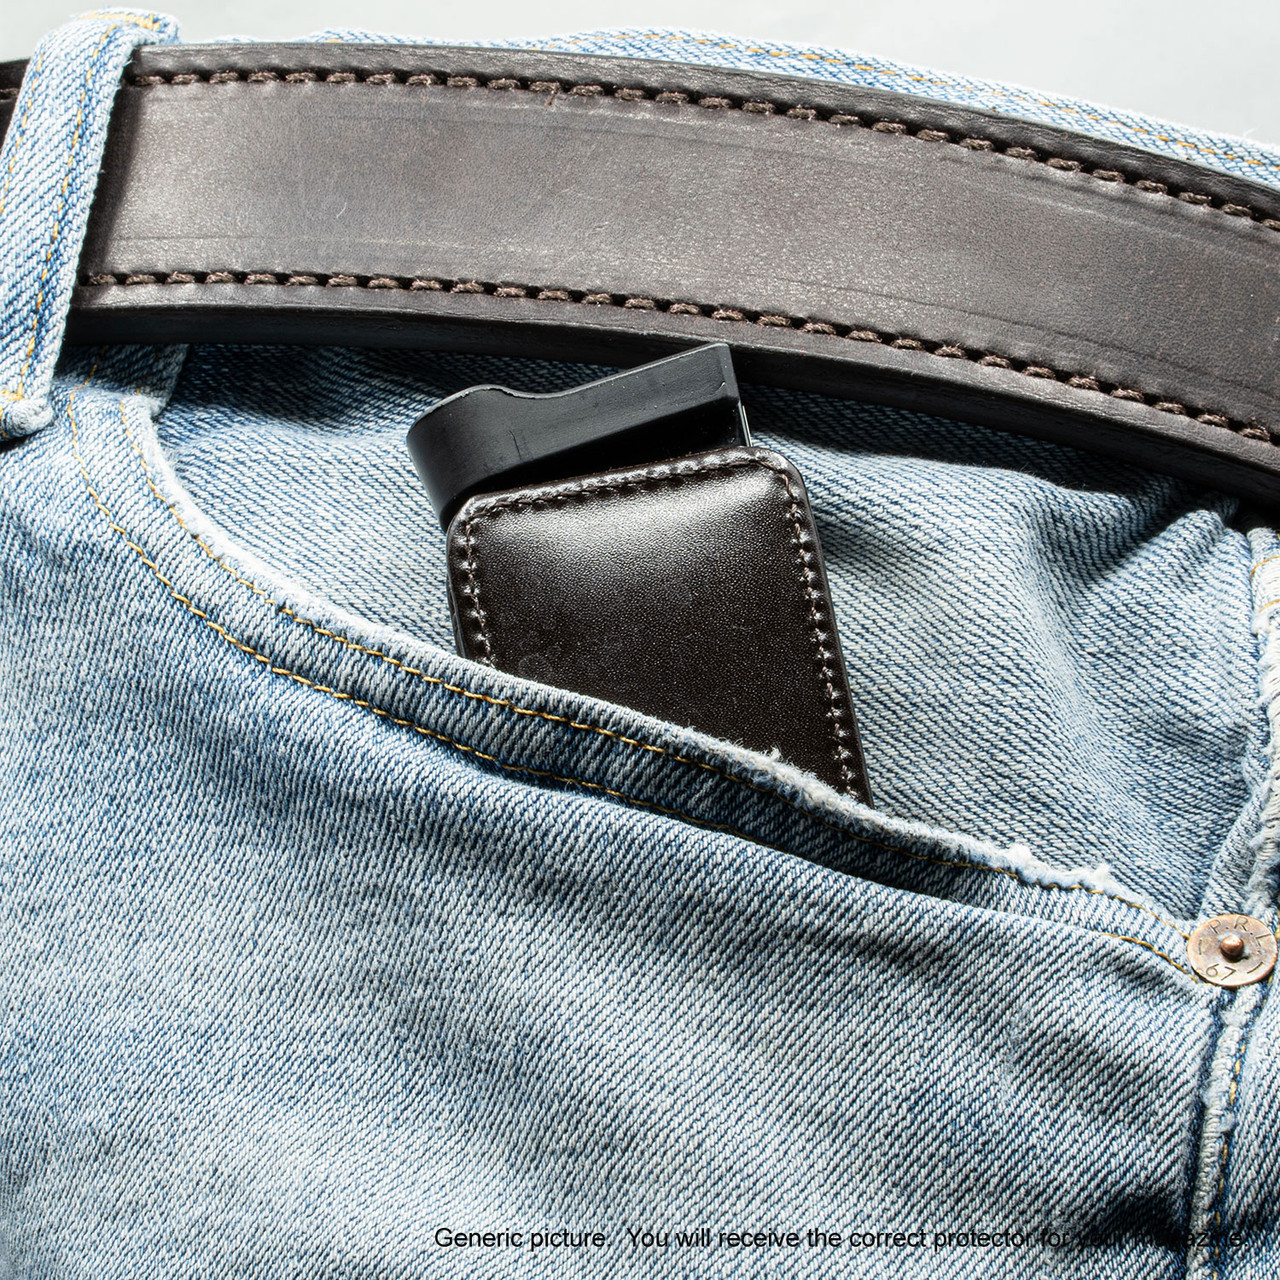 Glock 43X Brown Leather Magazine Pocket Protector